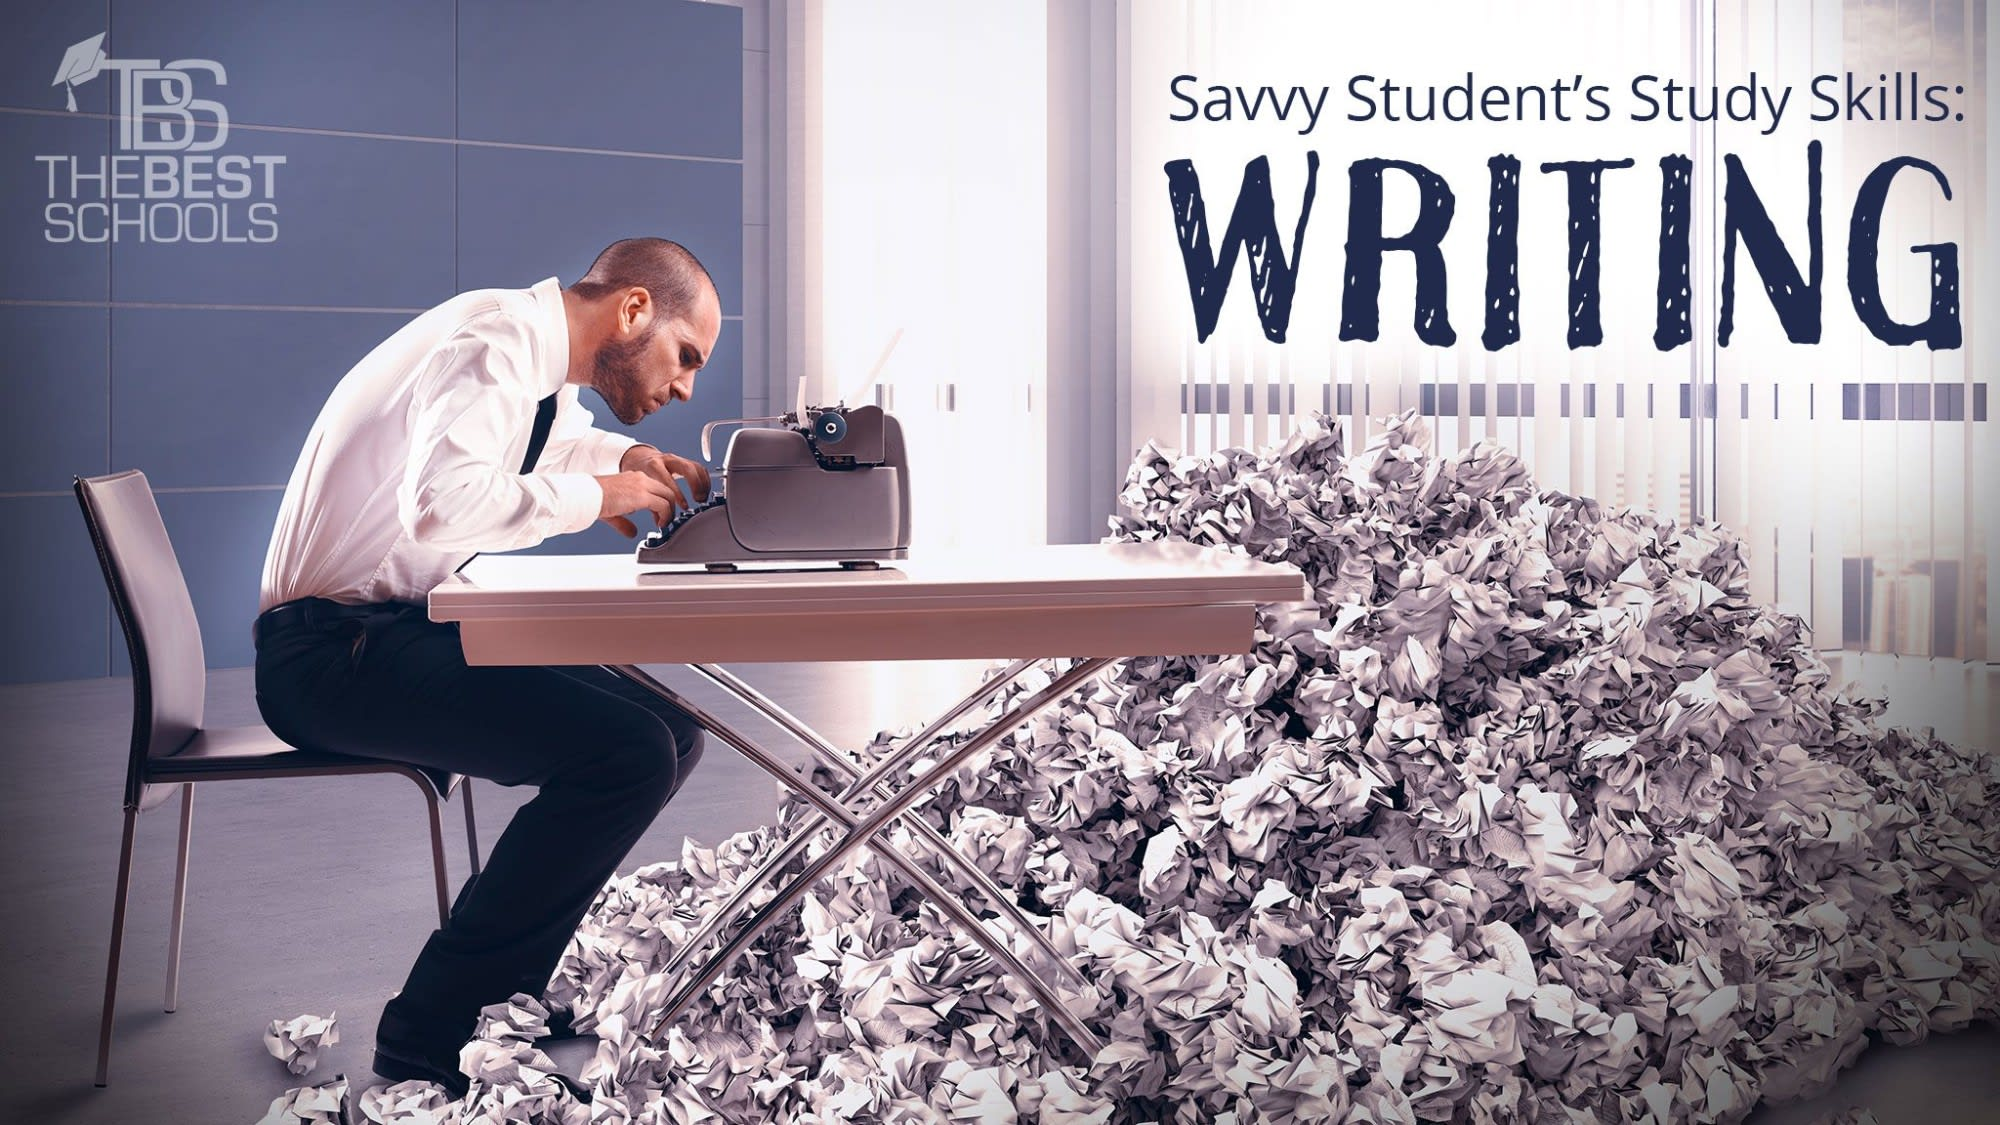 Savvy Student's Study Skills: Writing